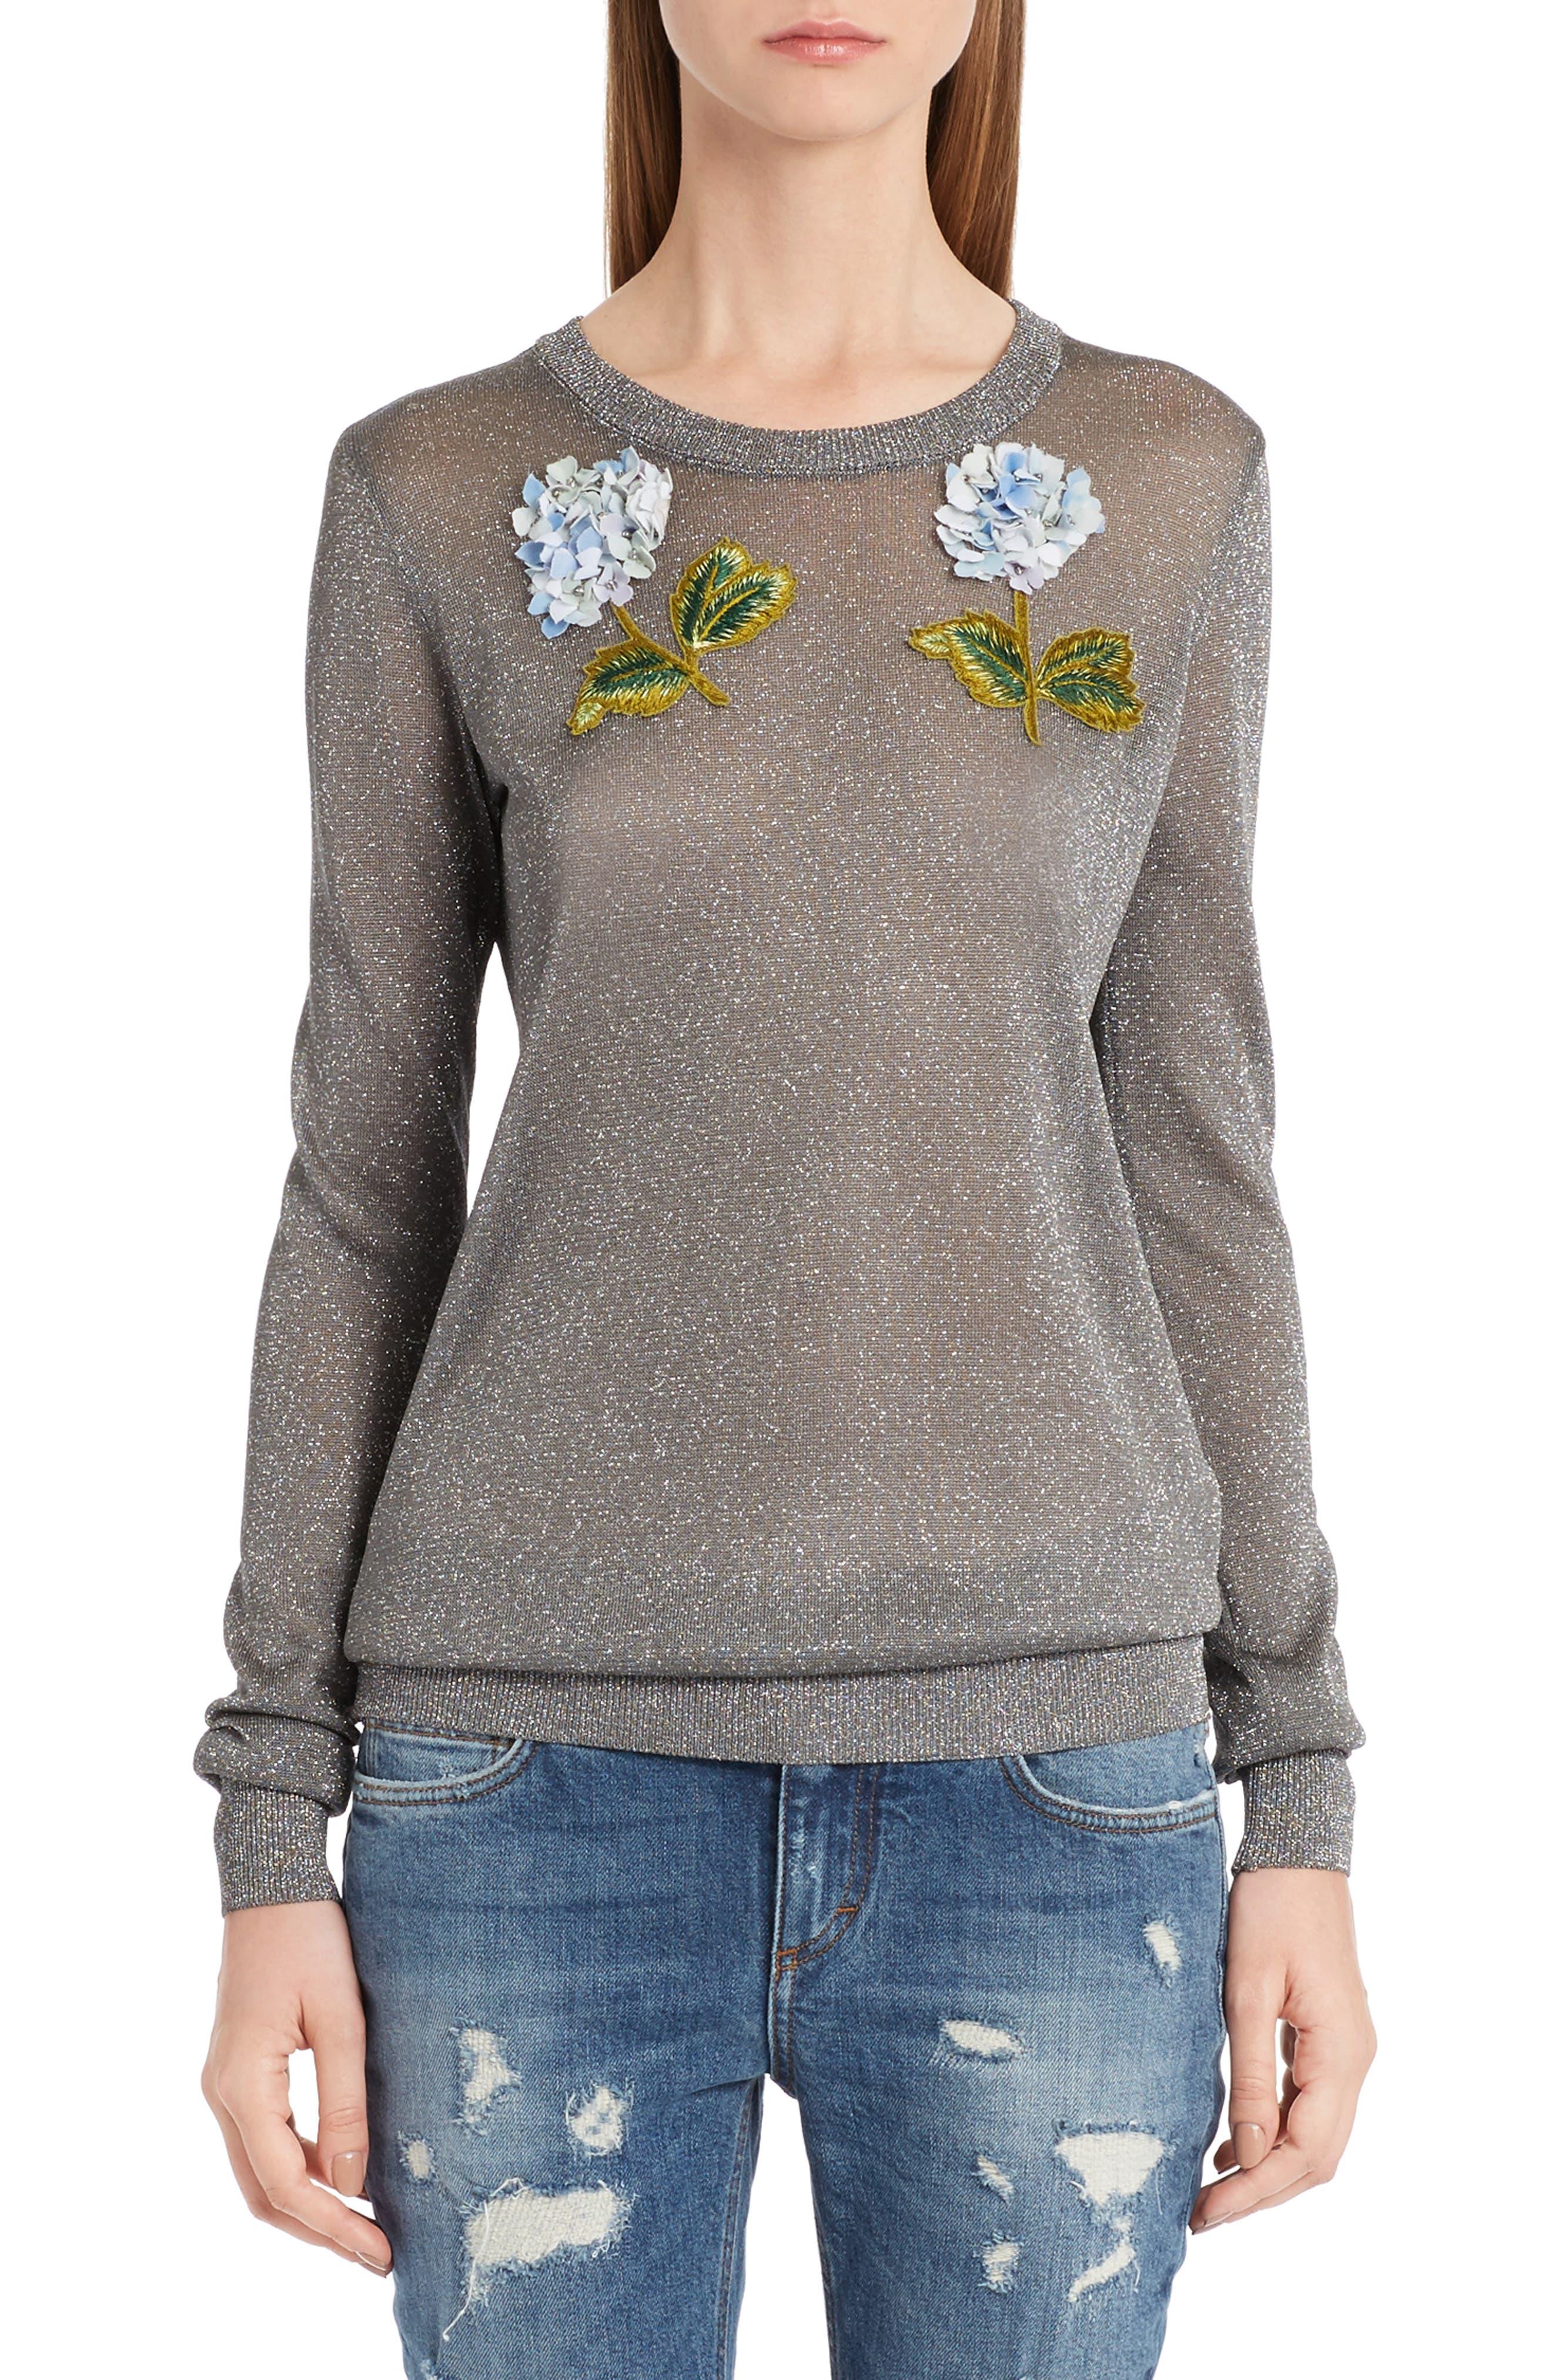 Dolce&Gabbana Embellished Metallic Sweater